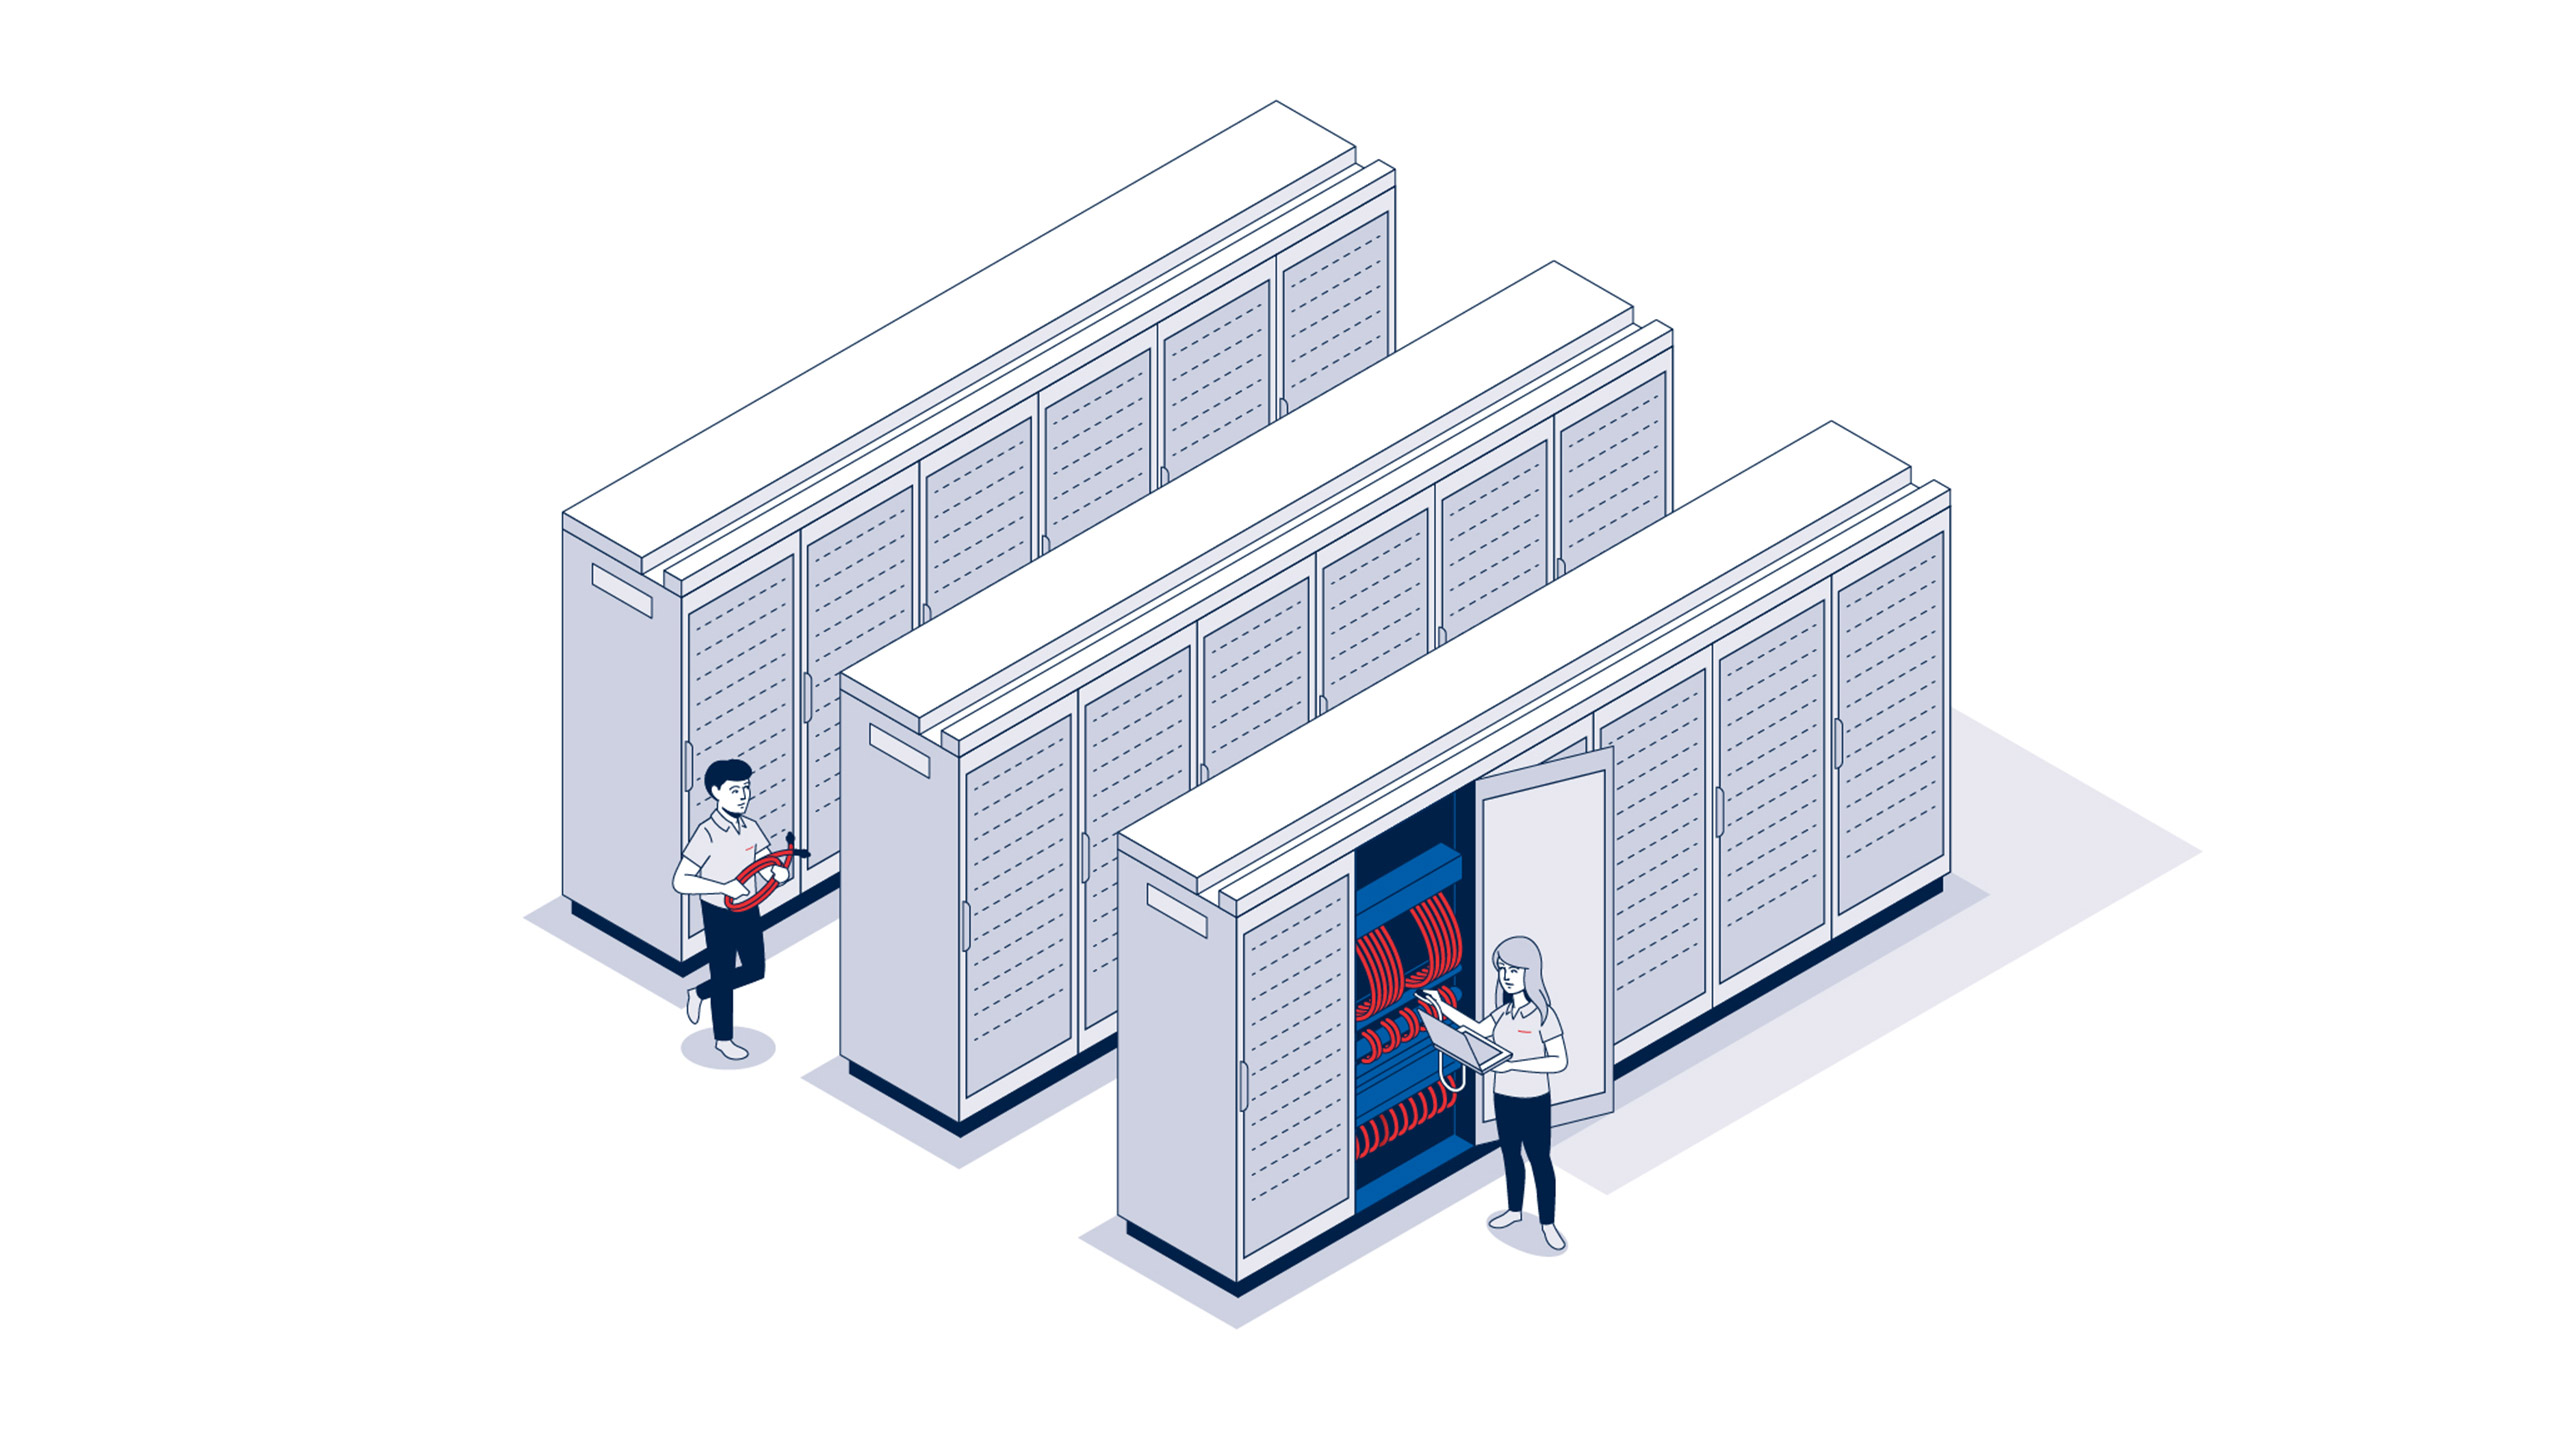 Rosenberger OSI Flatdesign Illustrationen